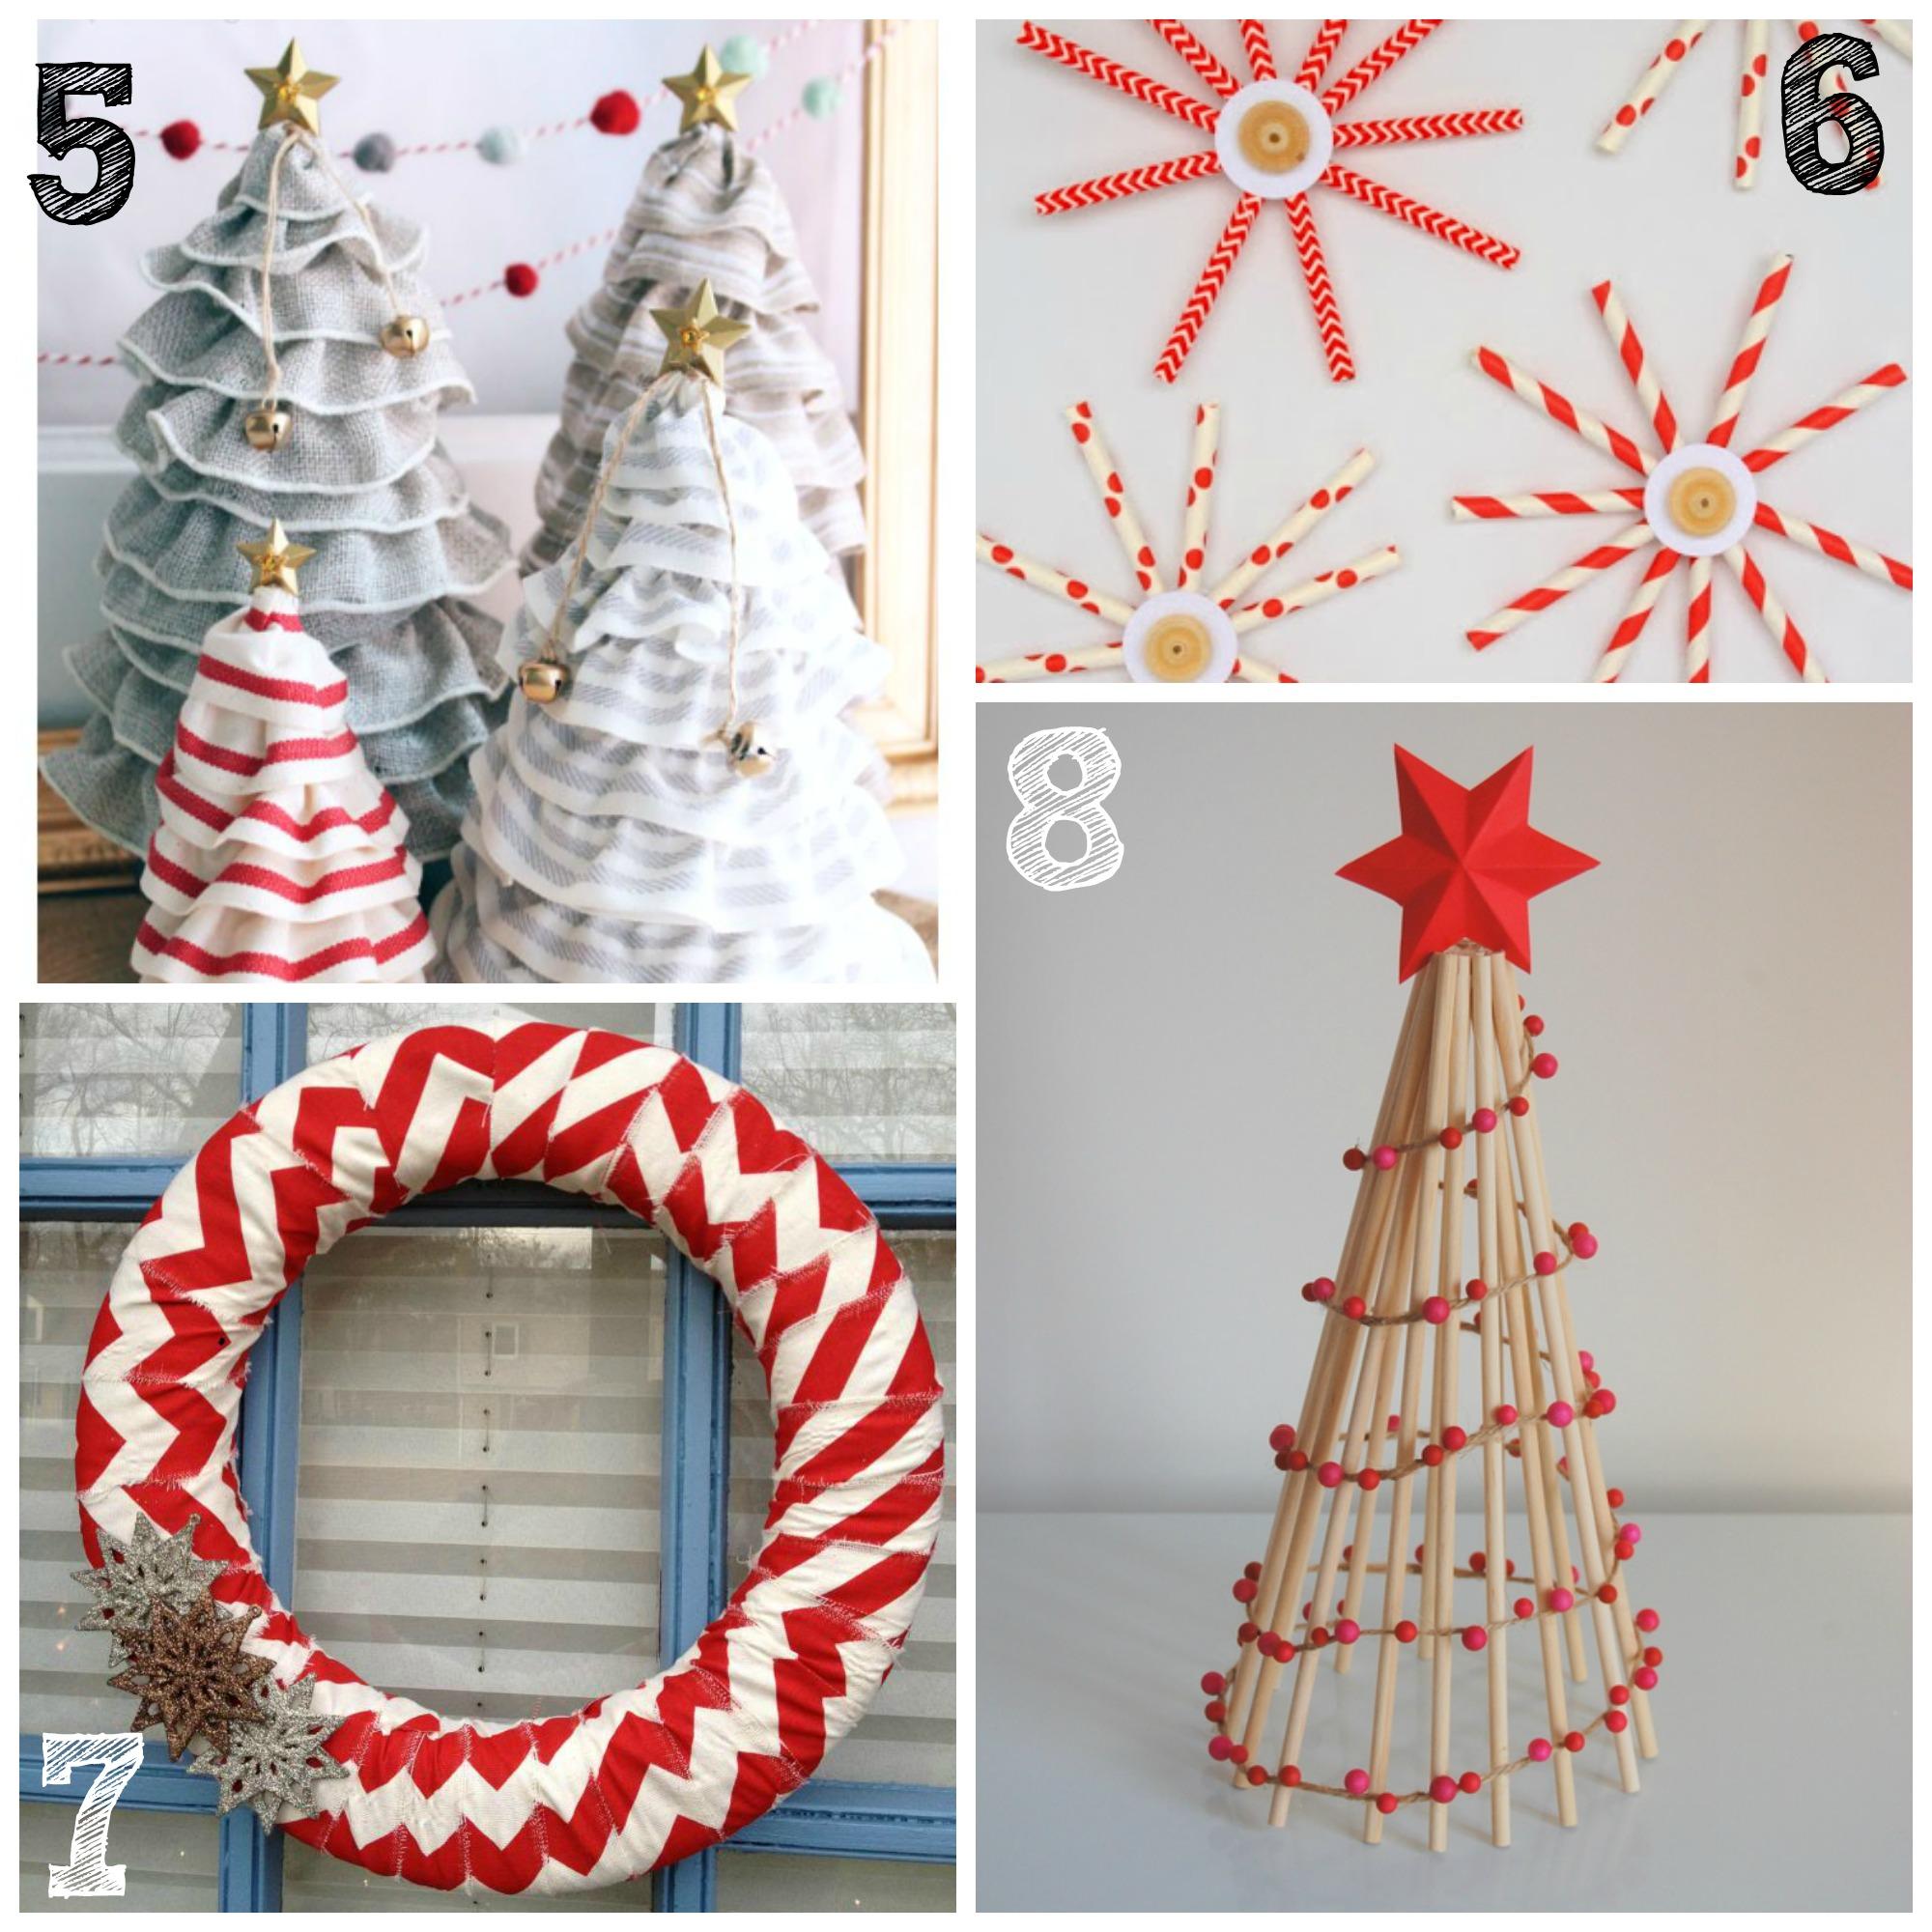 title | Diy Christmas Decorations Ideas